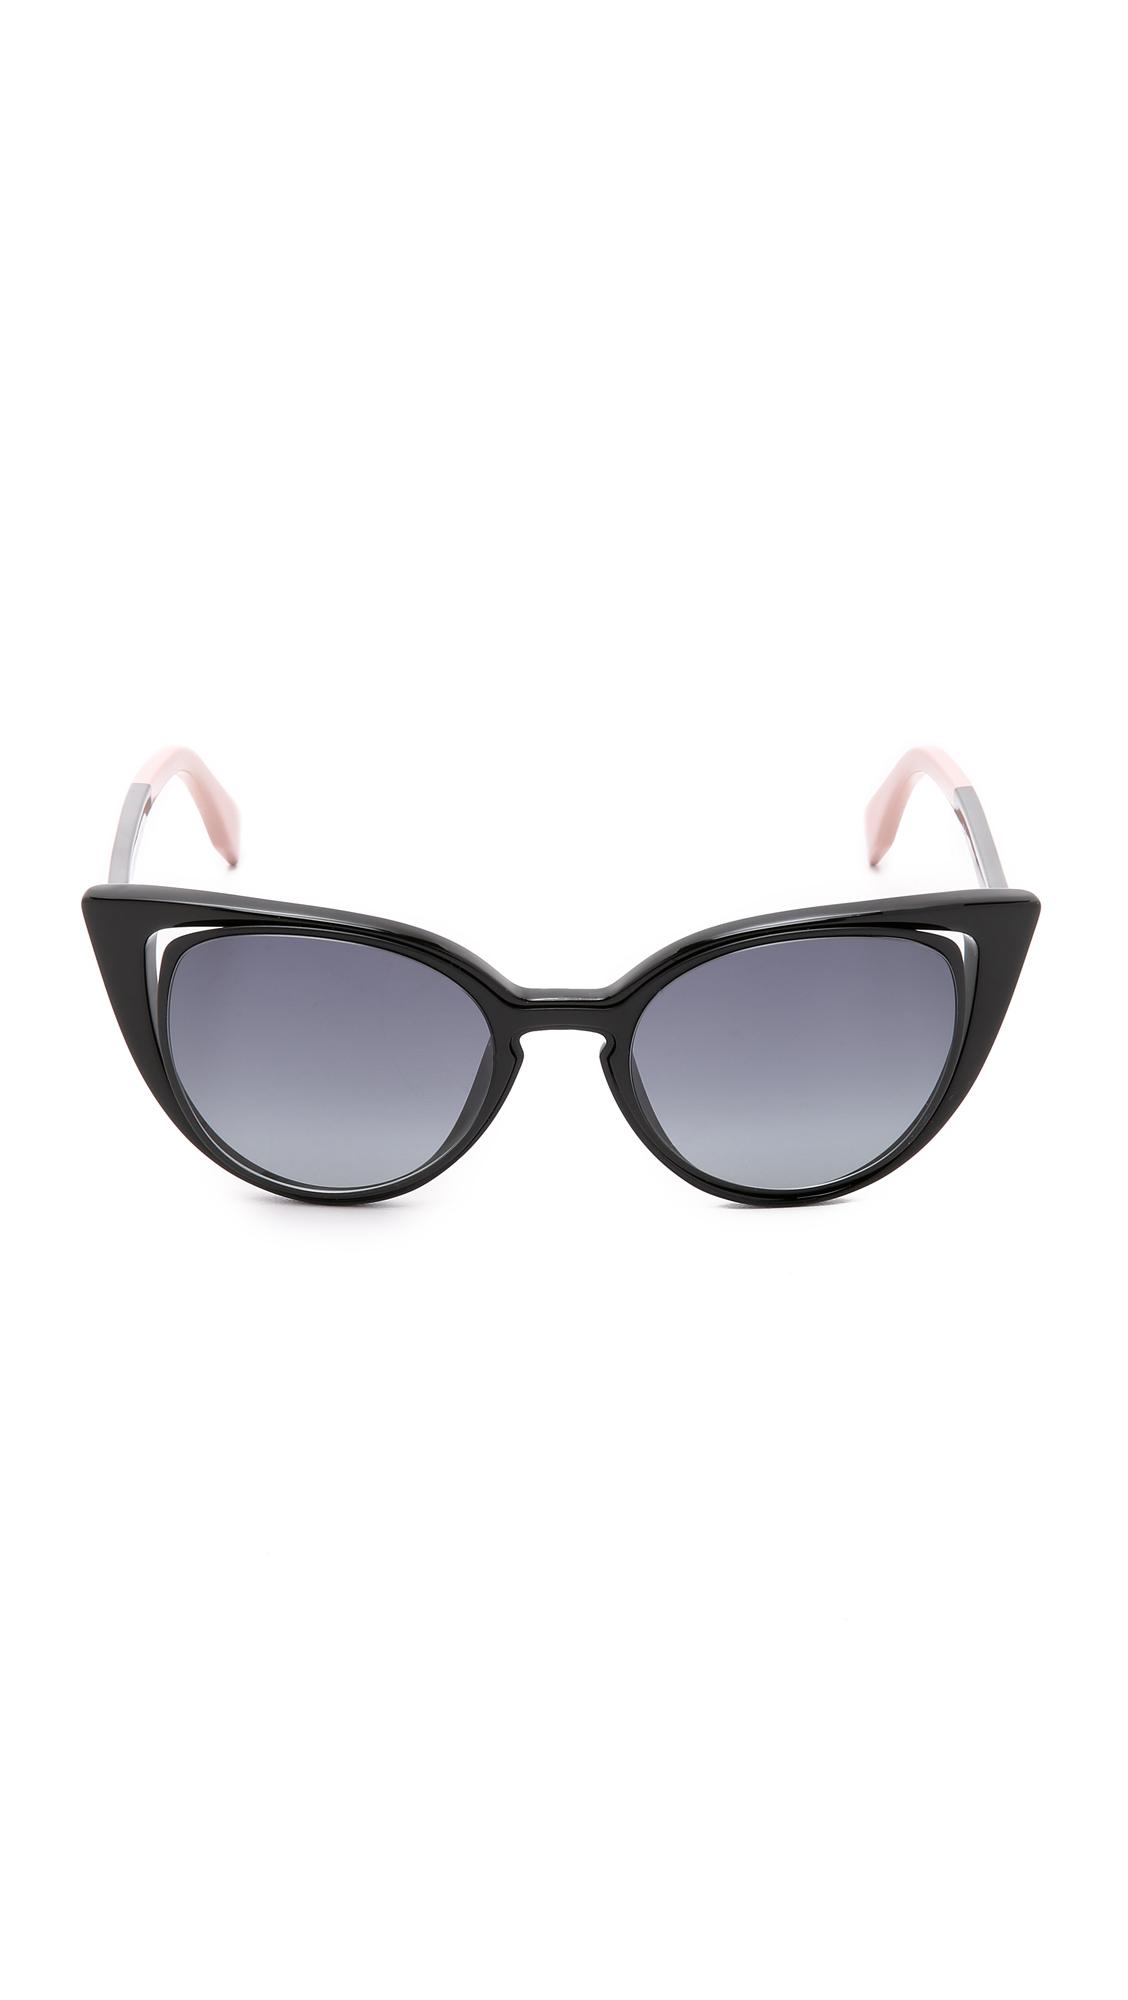 b584f61907d Lyst - Fendi Cutout Cat Eye Sunglasses - Gold White brown Shade in Black